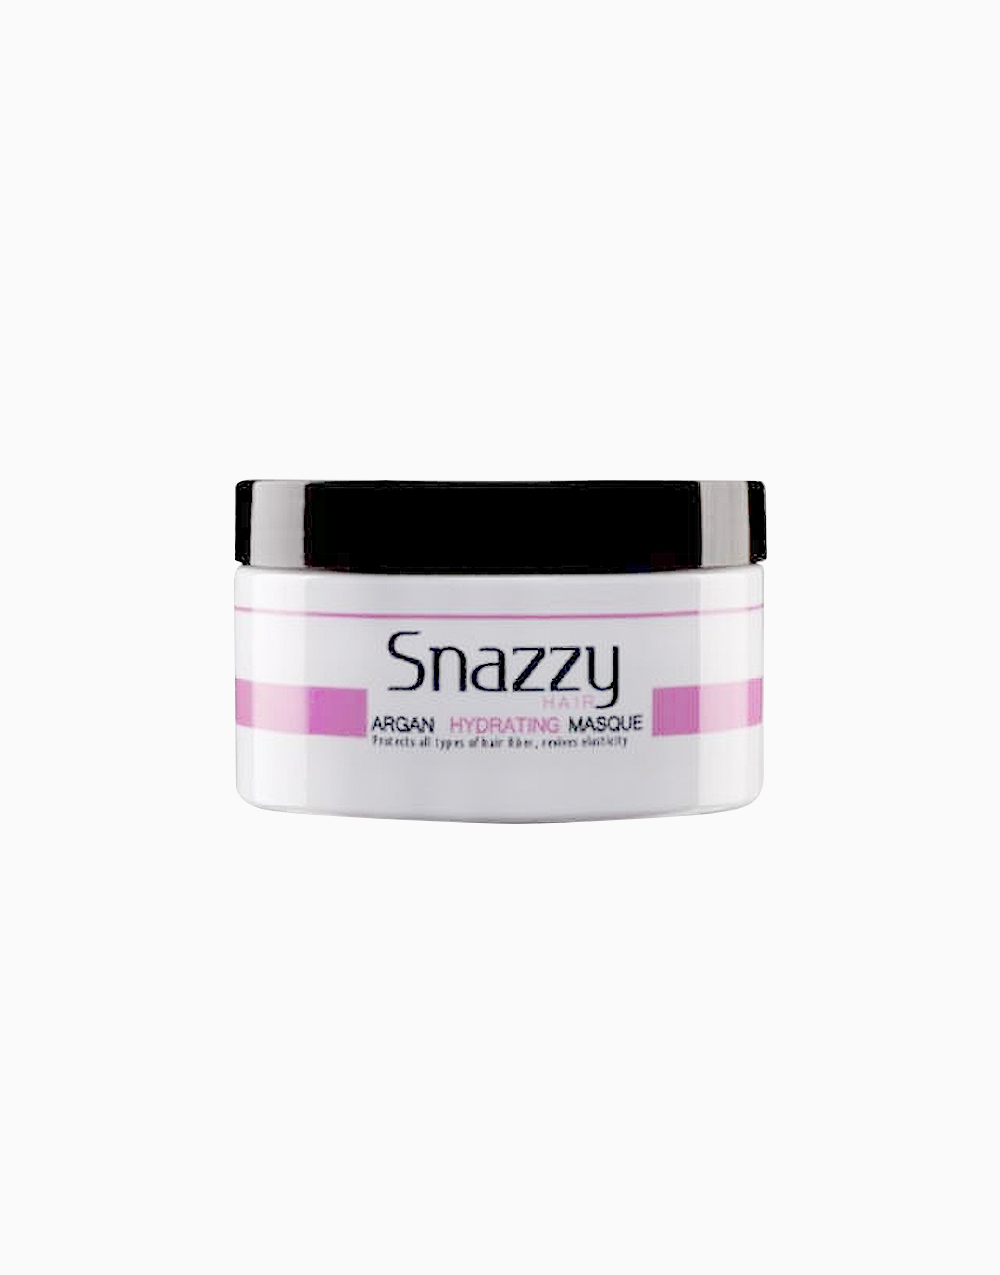 Argan Masque (250ml) by Snazzy Hair